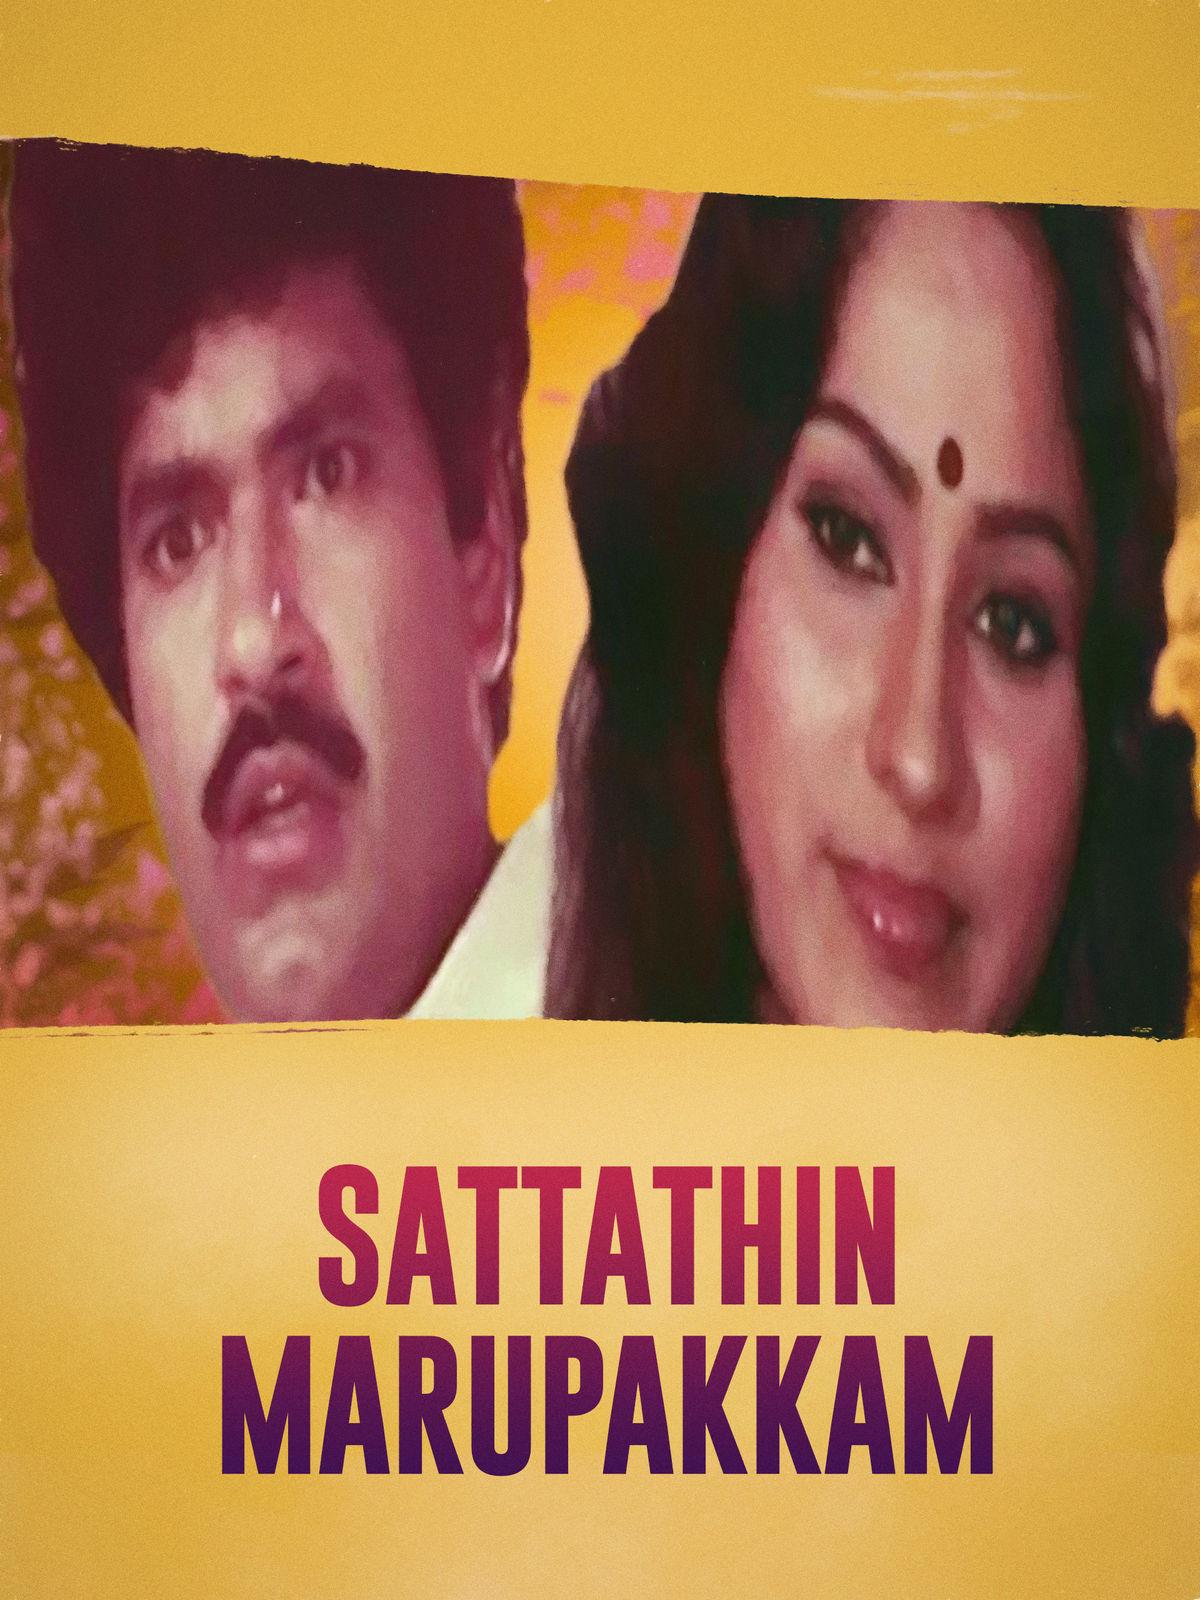 Sattathin Marupakkam